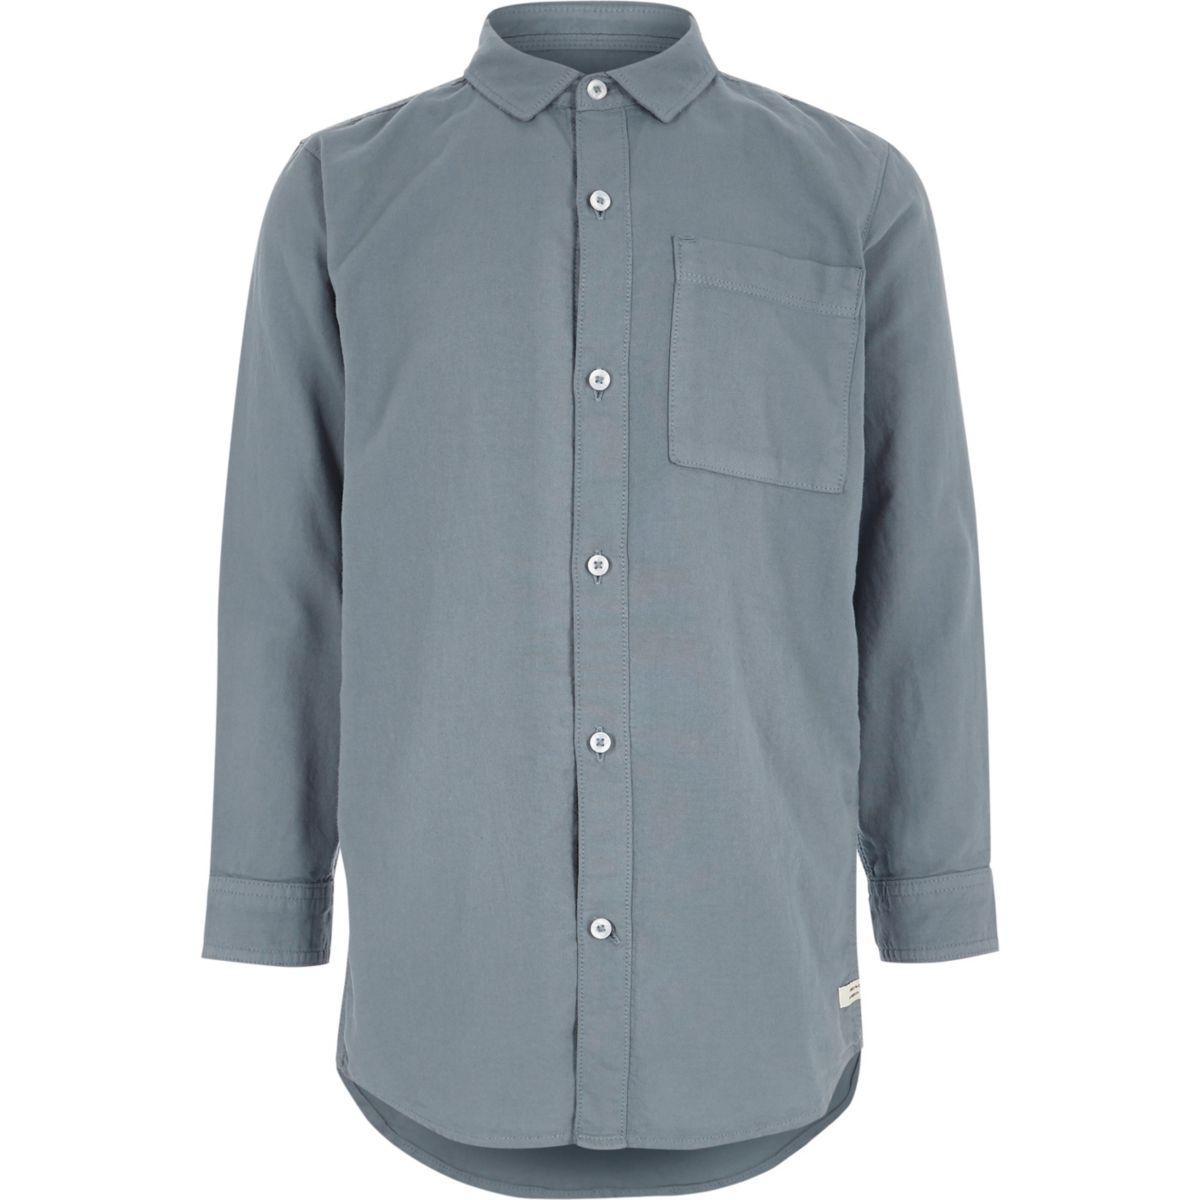 Boys washed blue long sleeve Oxford shirt